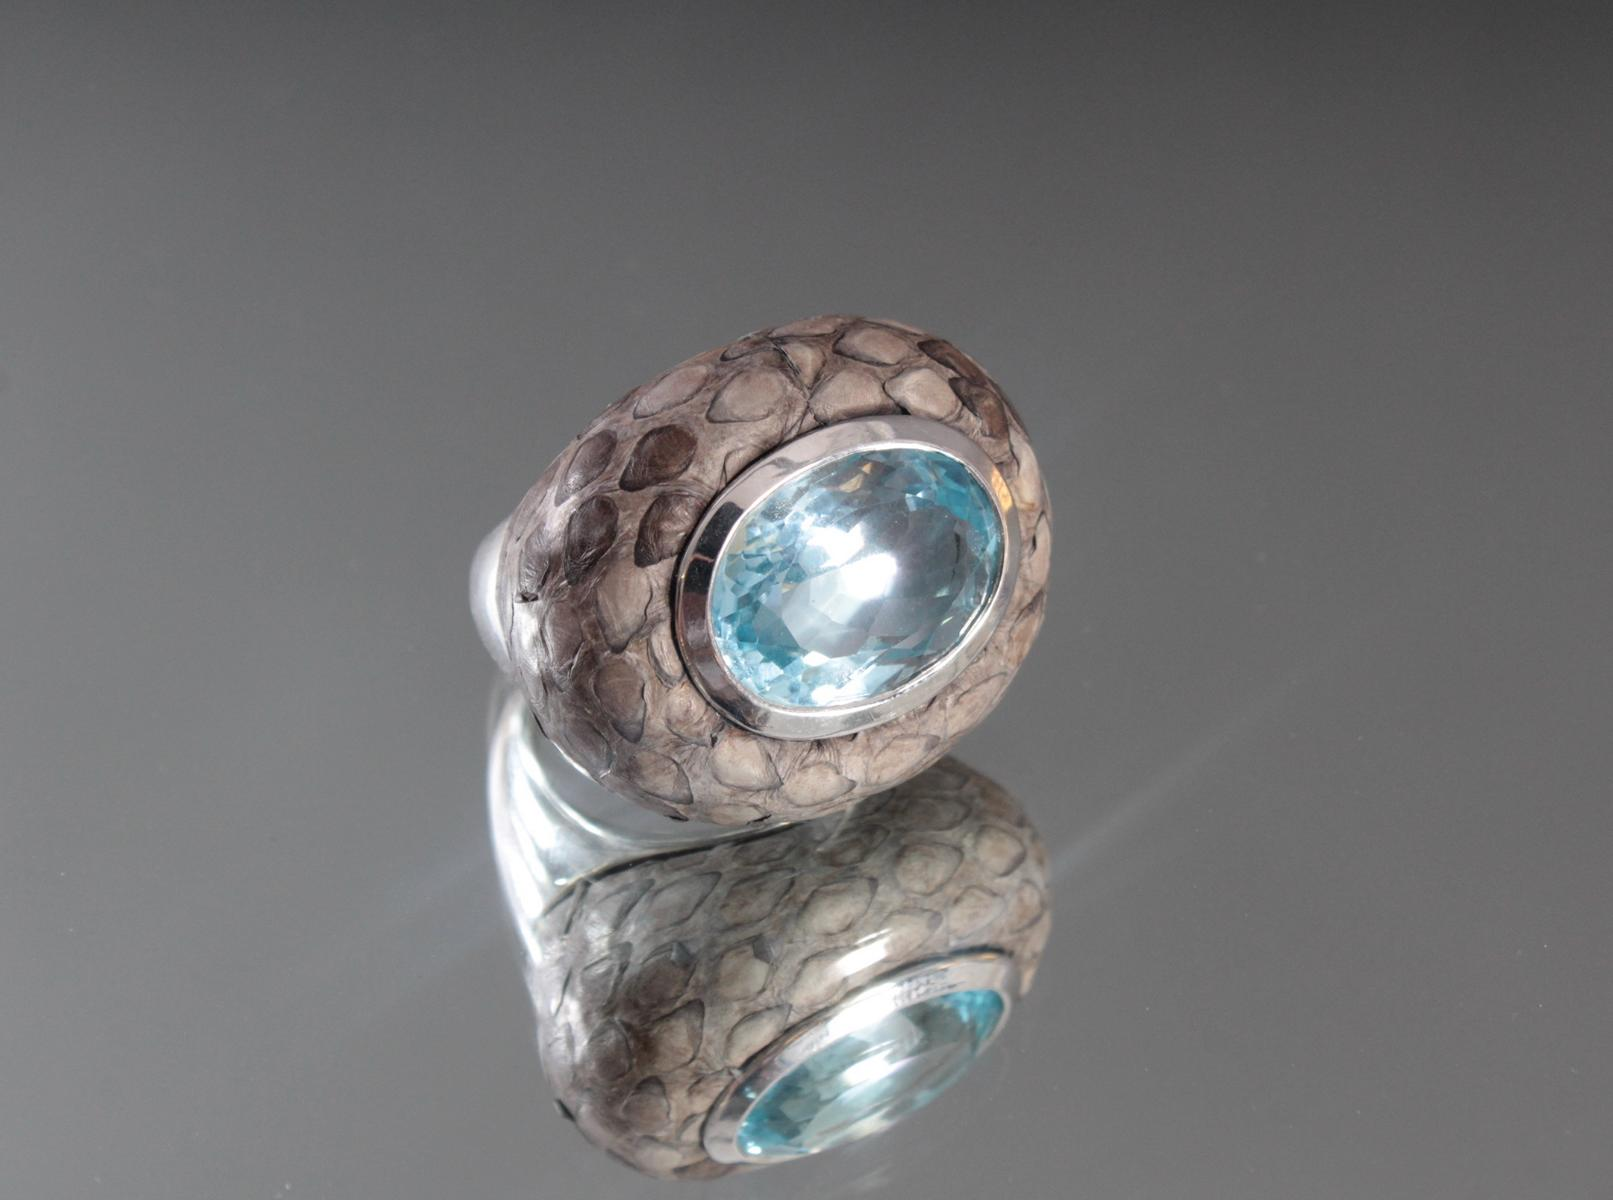 Damenring aus Sterlingsilber, Aquamarin und Schlangenhaut-2